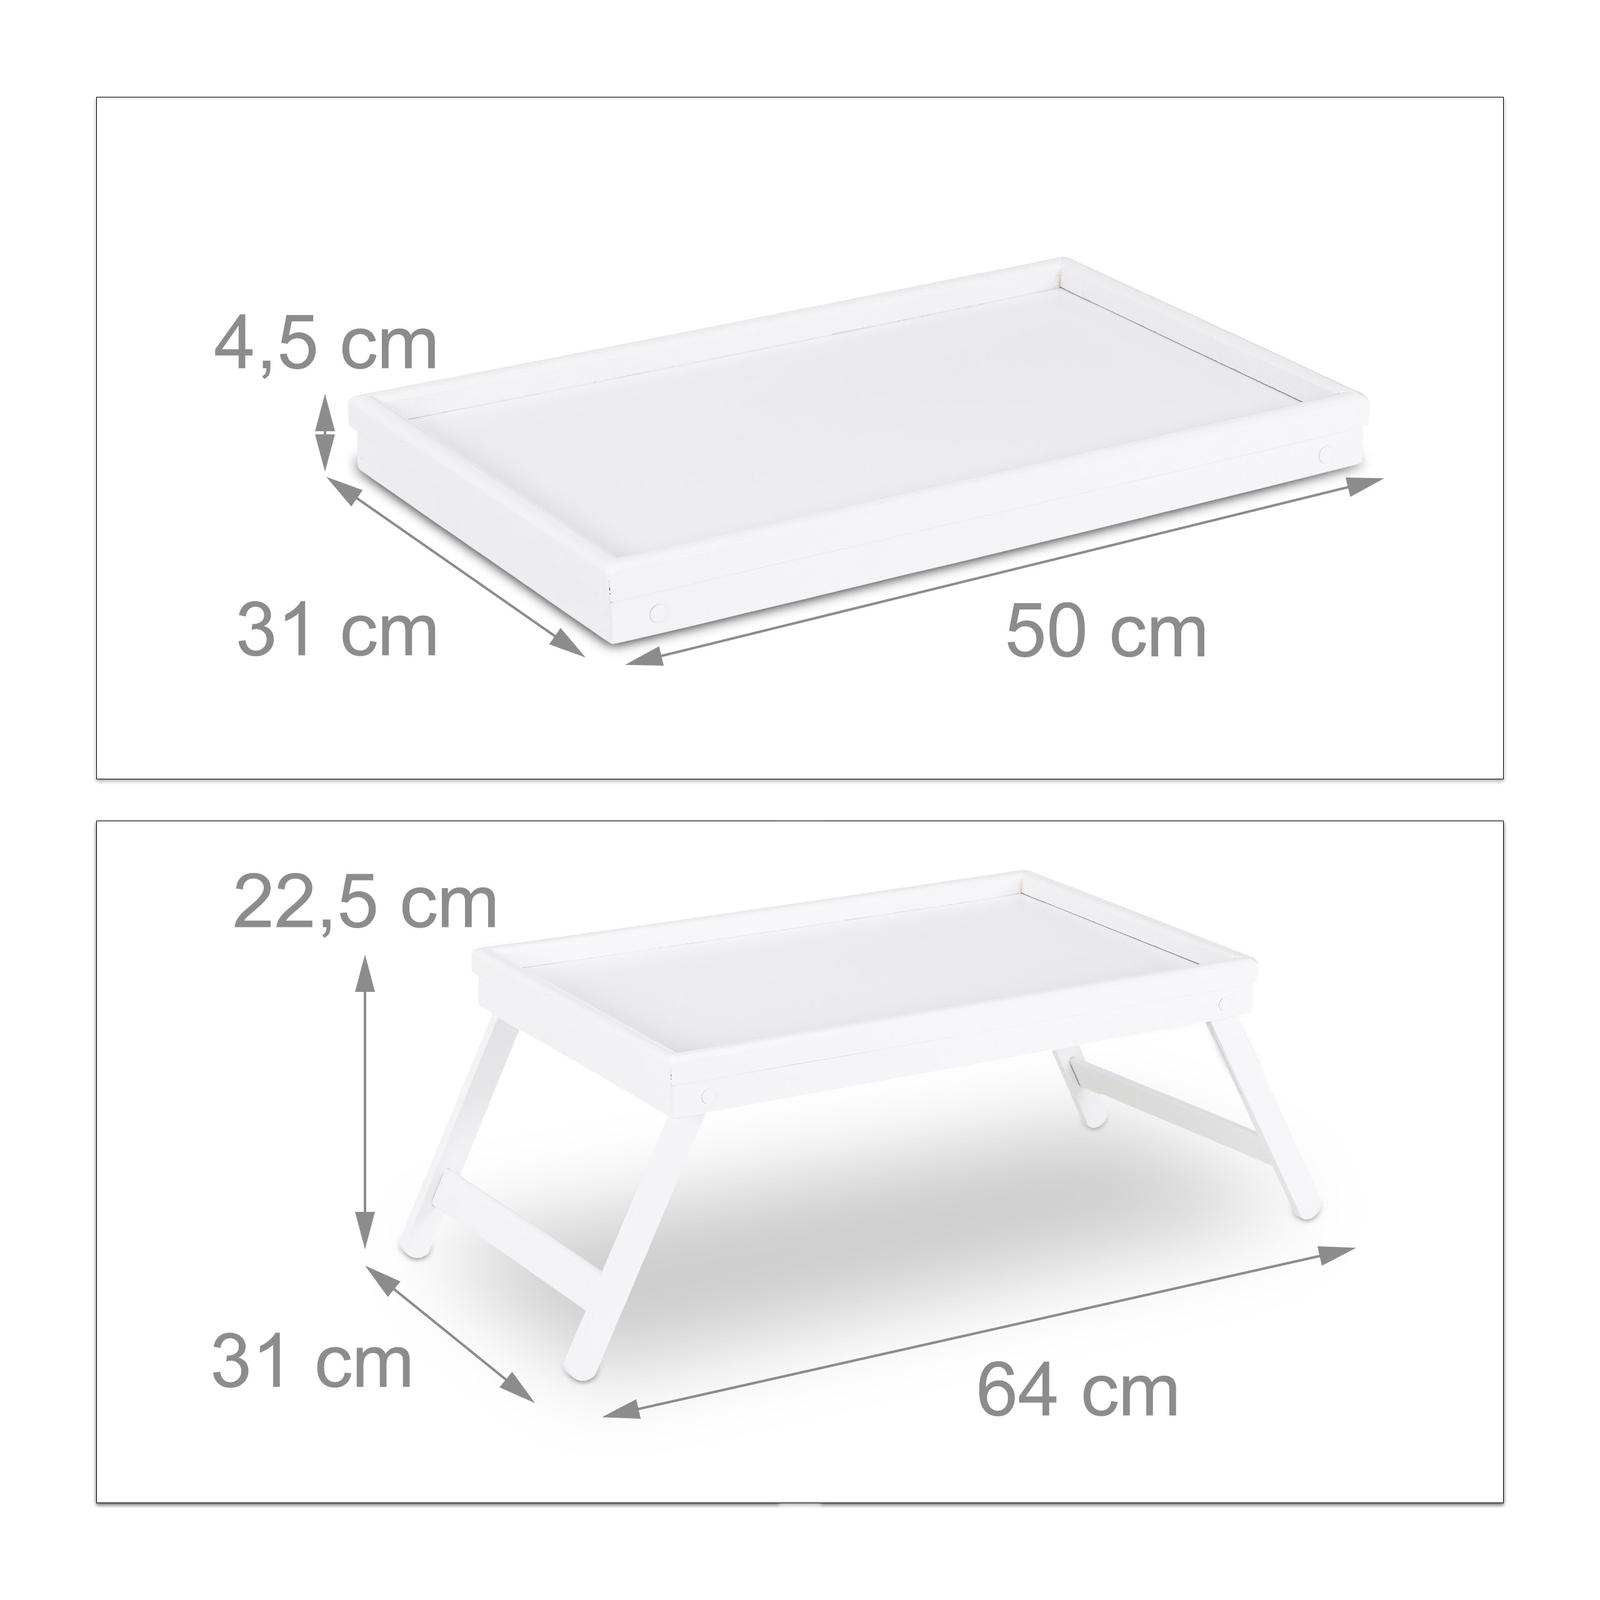 Stolík pre notebook, raňajkové stolíky - Obrázok č. 22